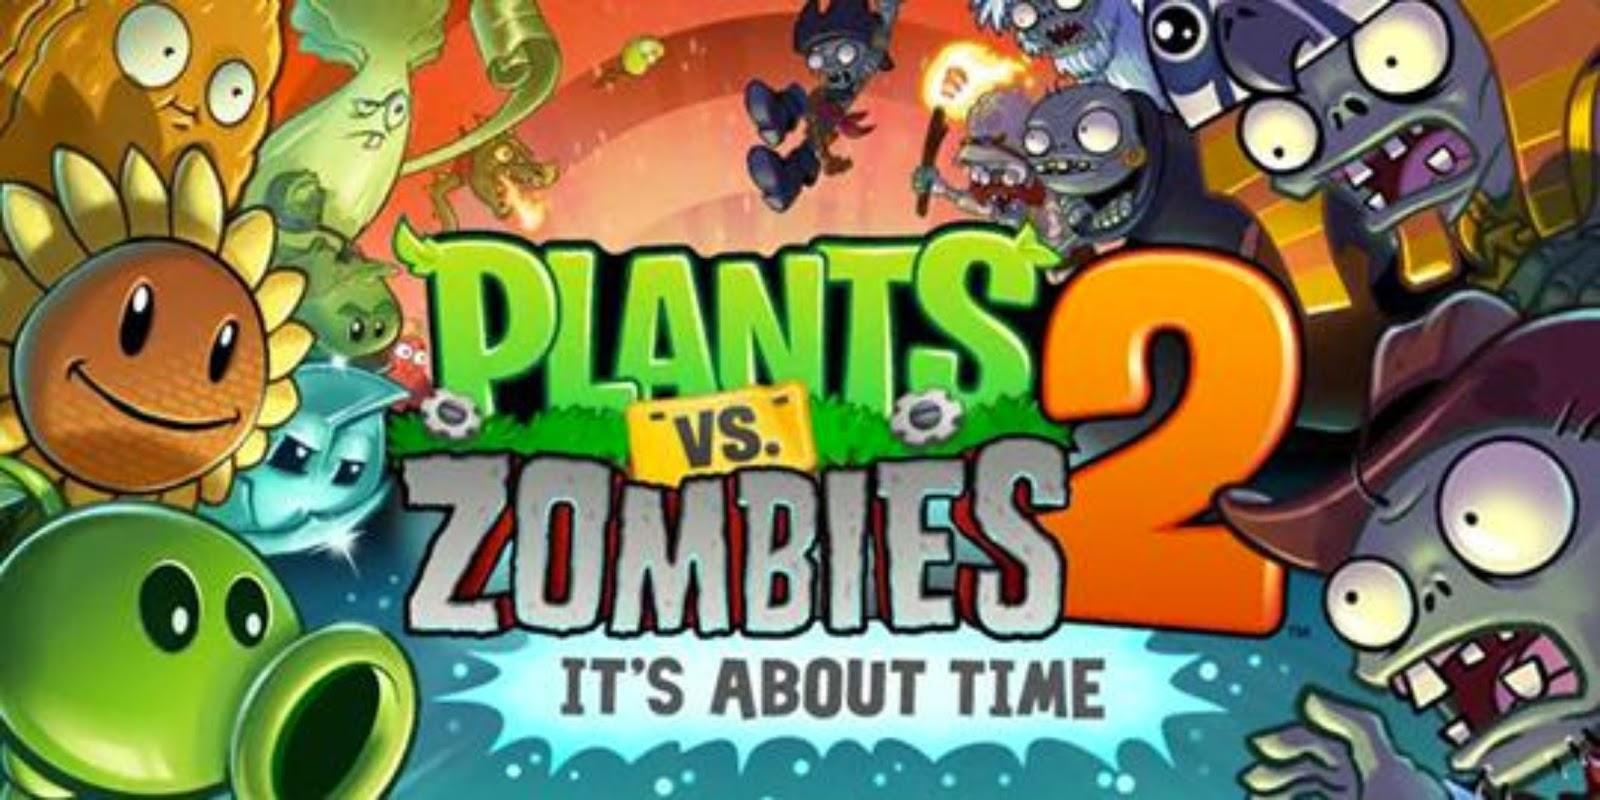 Plants vs. Zombies 2 Apk+Data Mod v3.5.1 Free Full Android